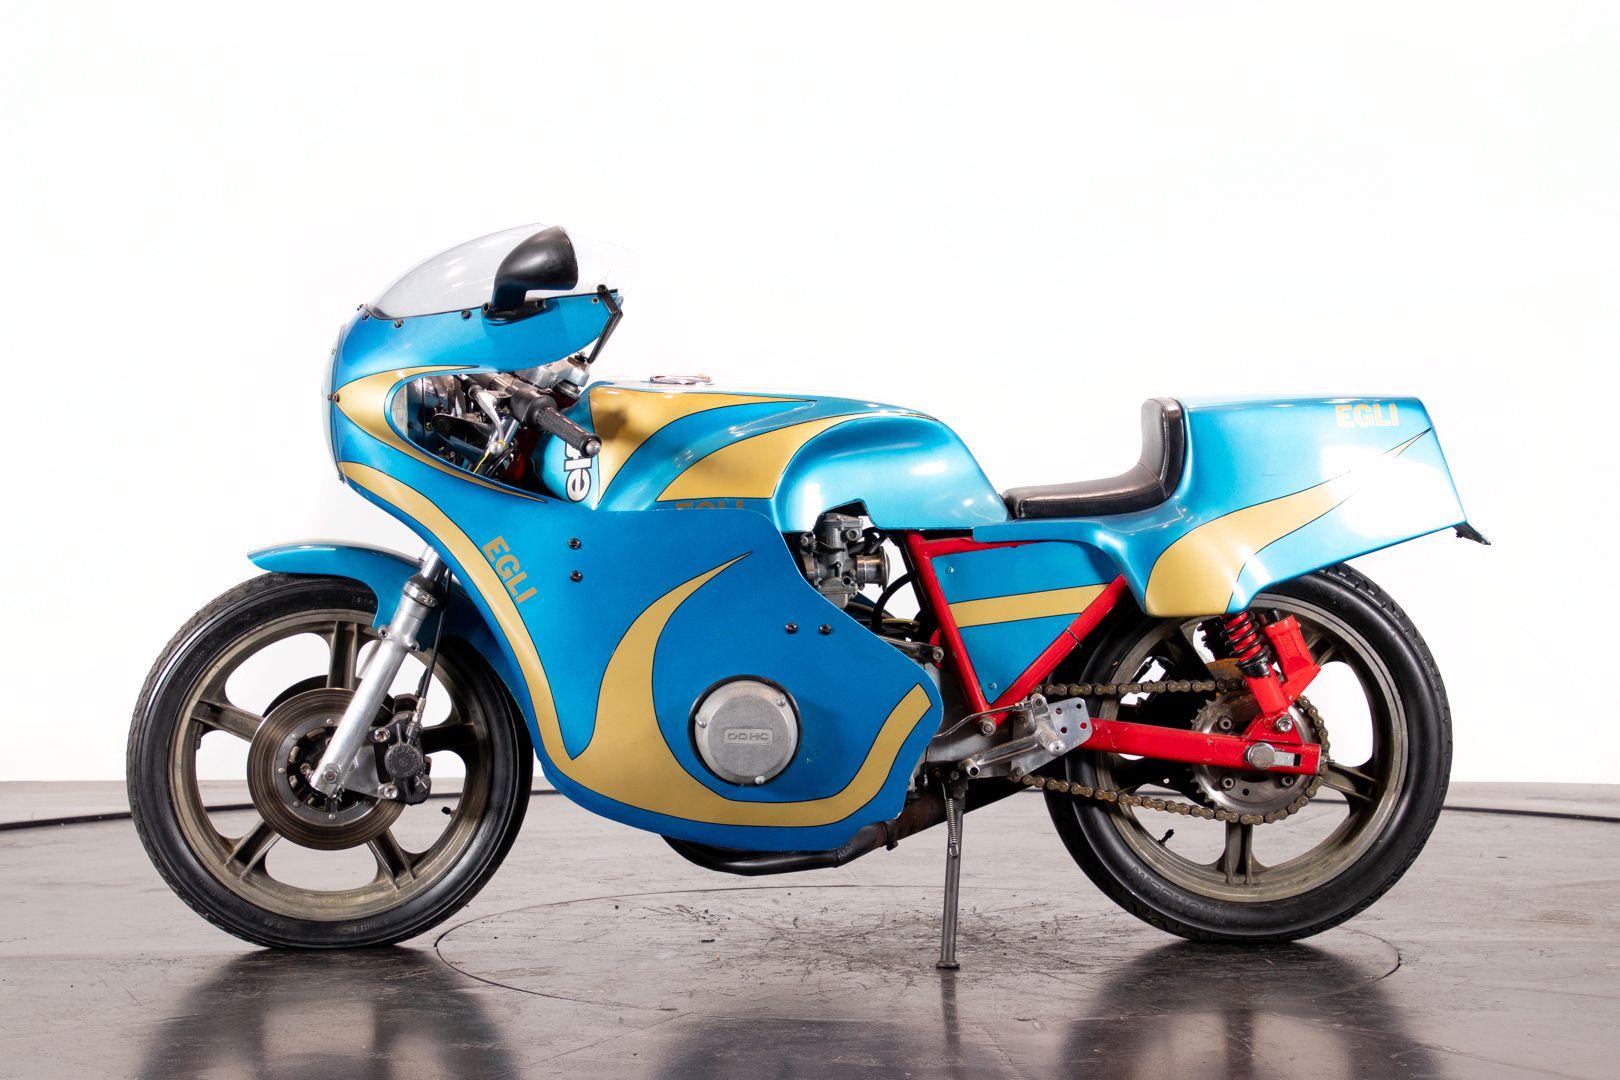 1976 Kawasaki Egli 900 74859